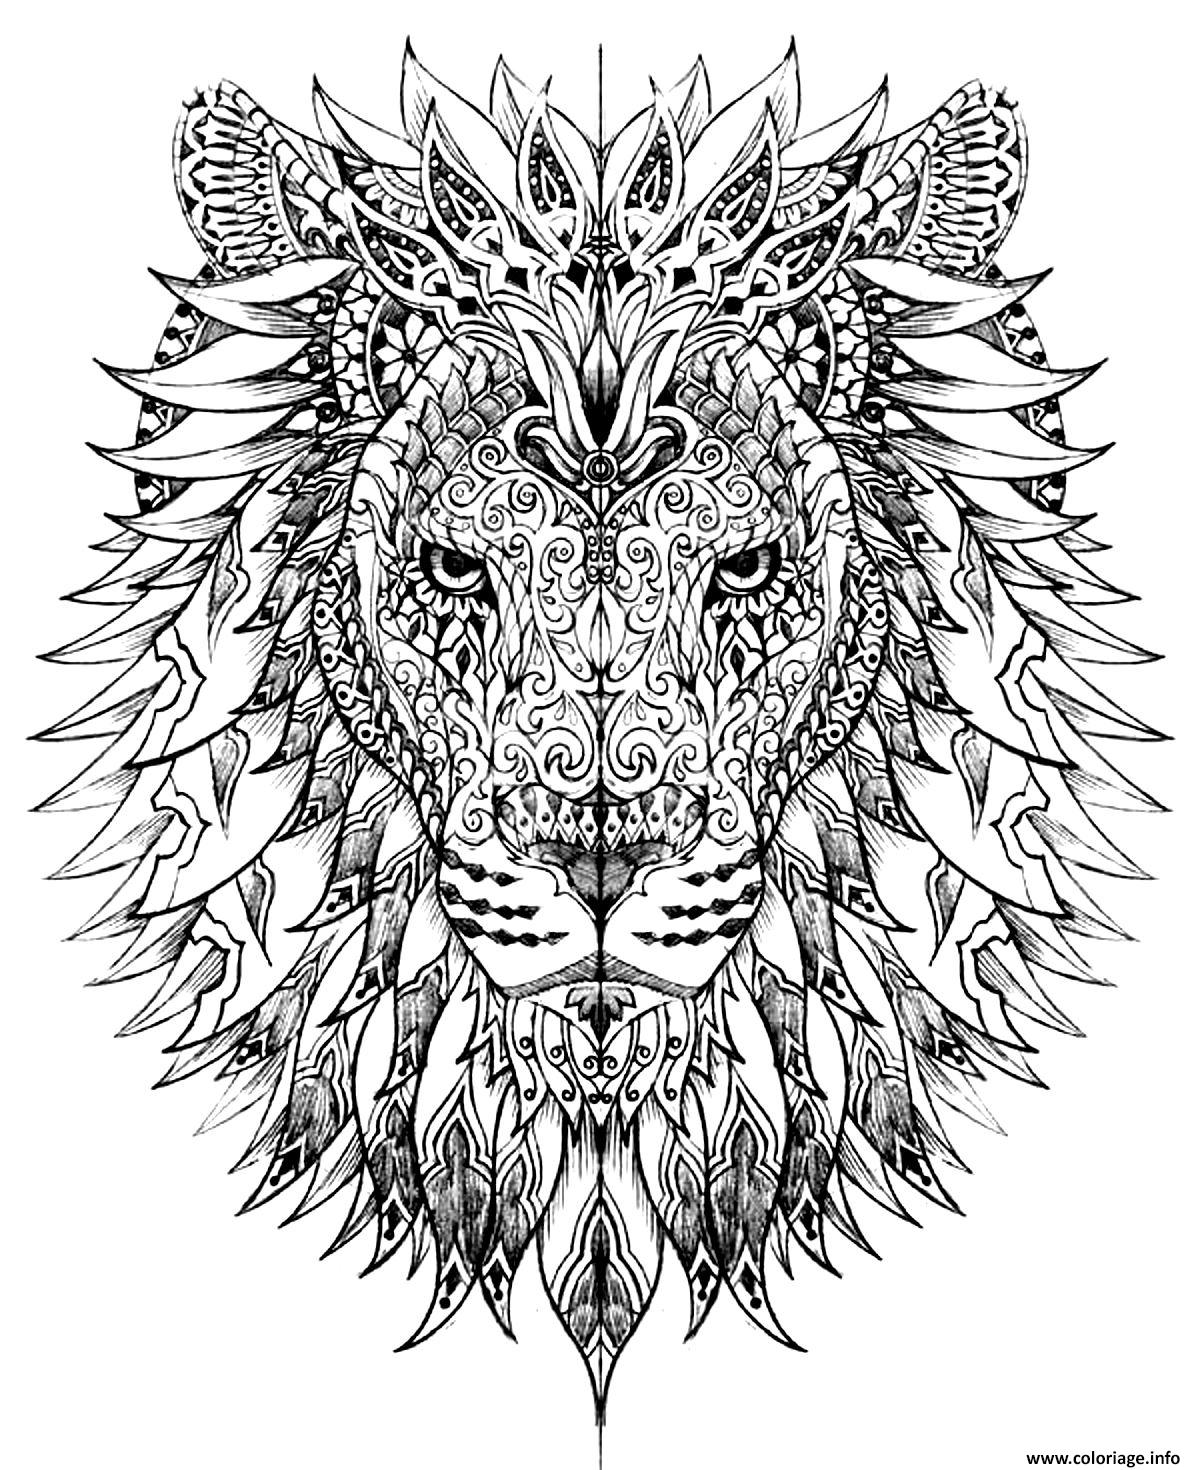 Coloriage adulte difficile tete lion dessin - Coloriage difficile a colorier ...